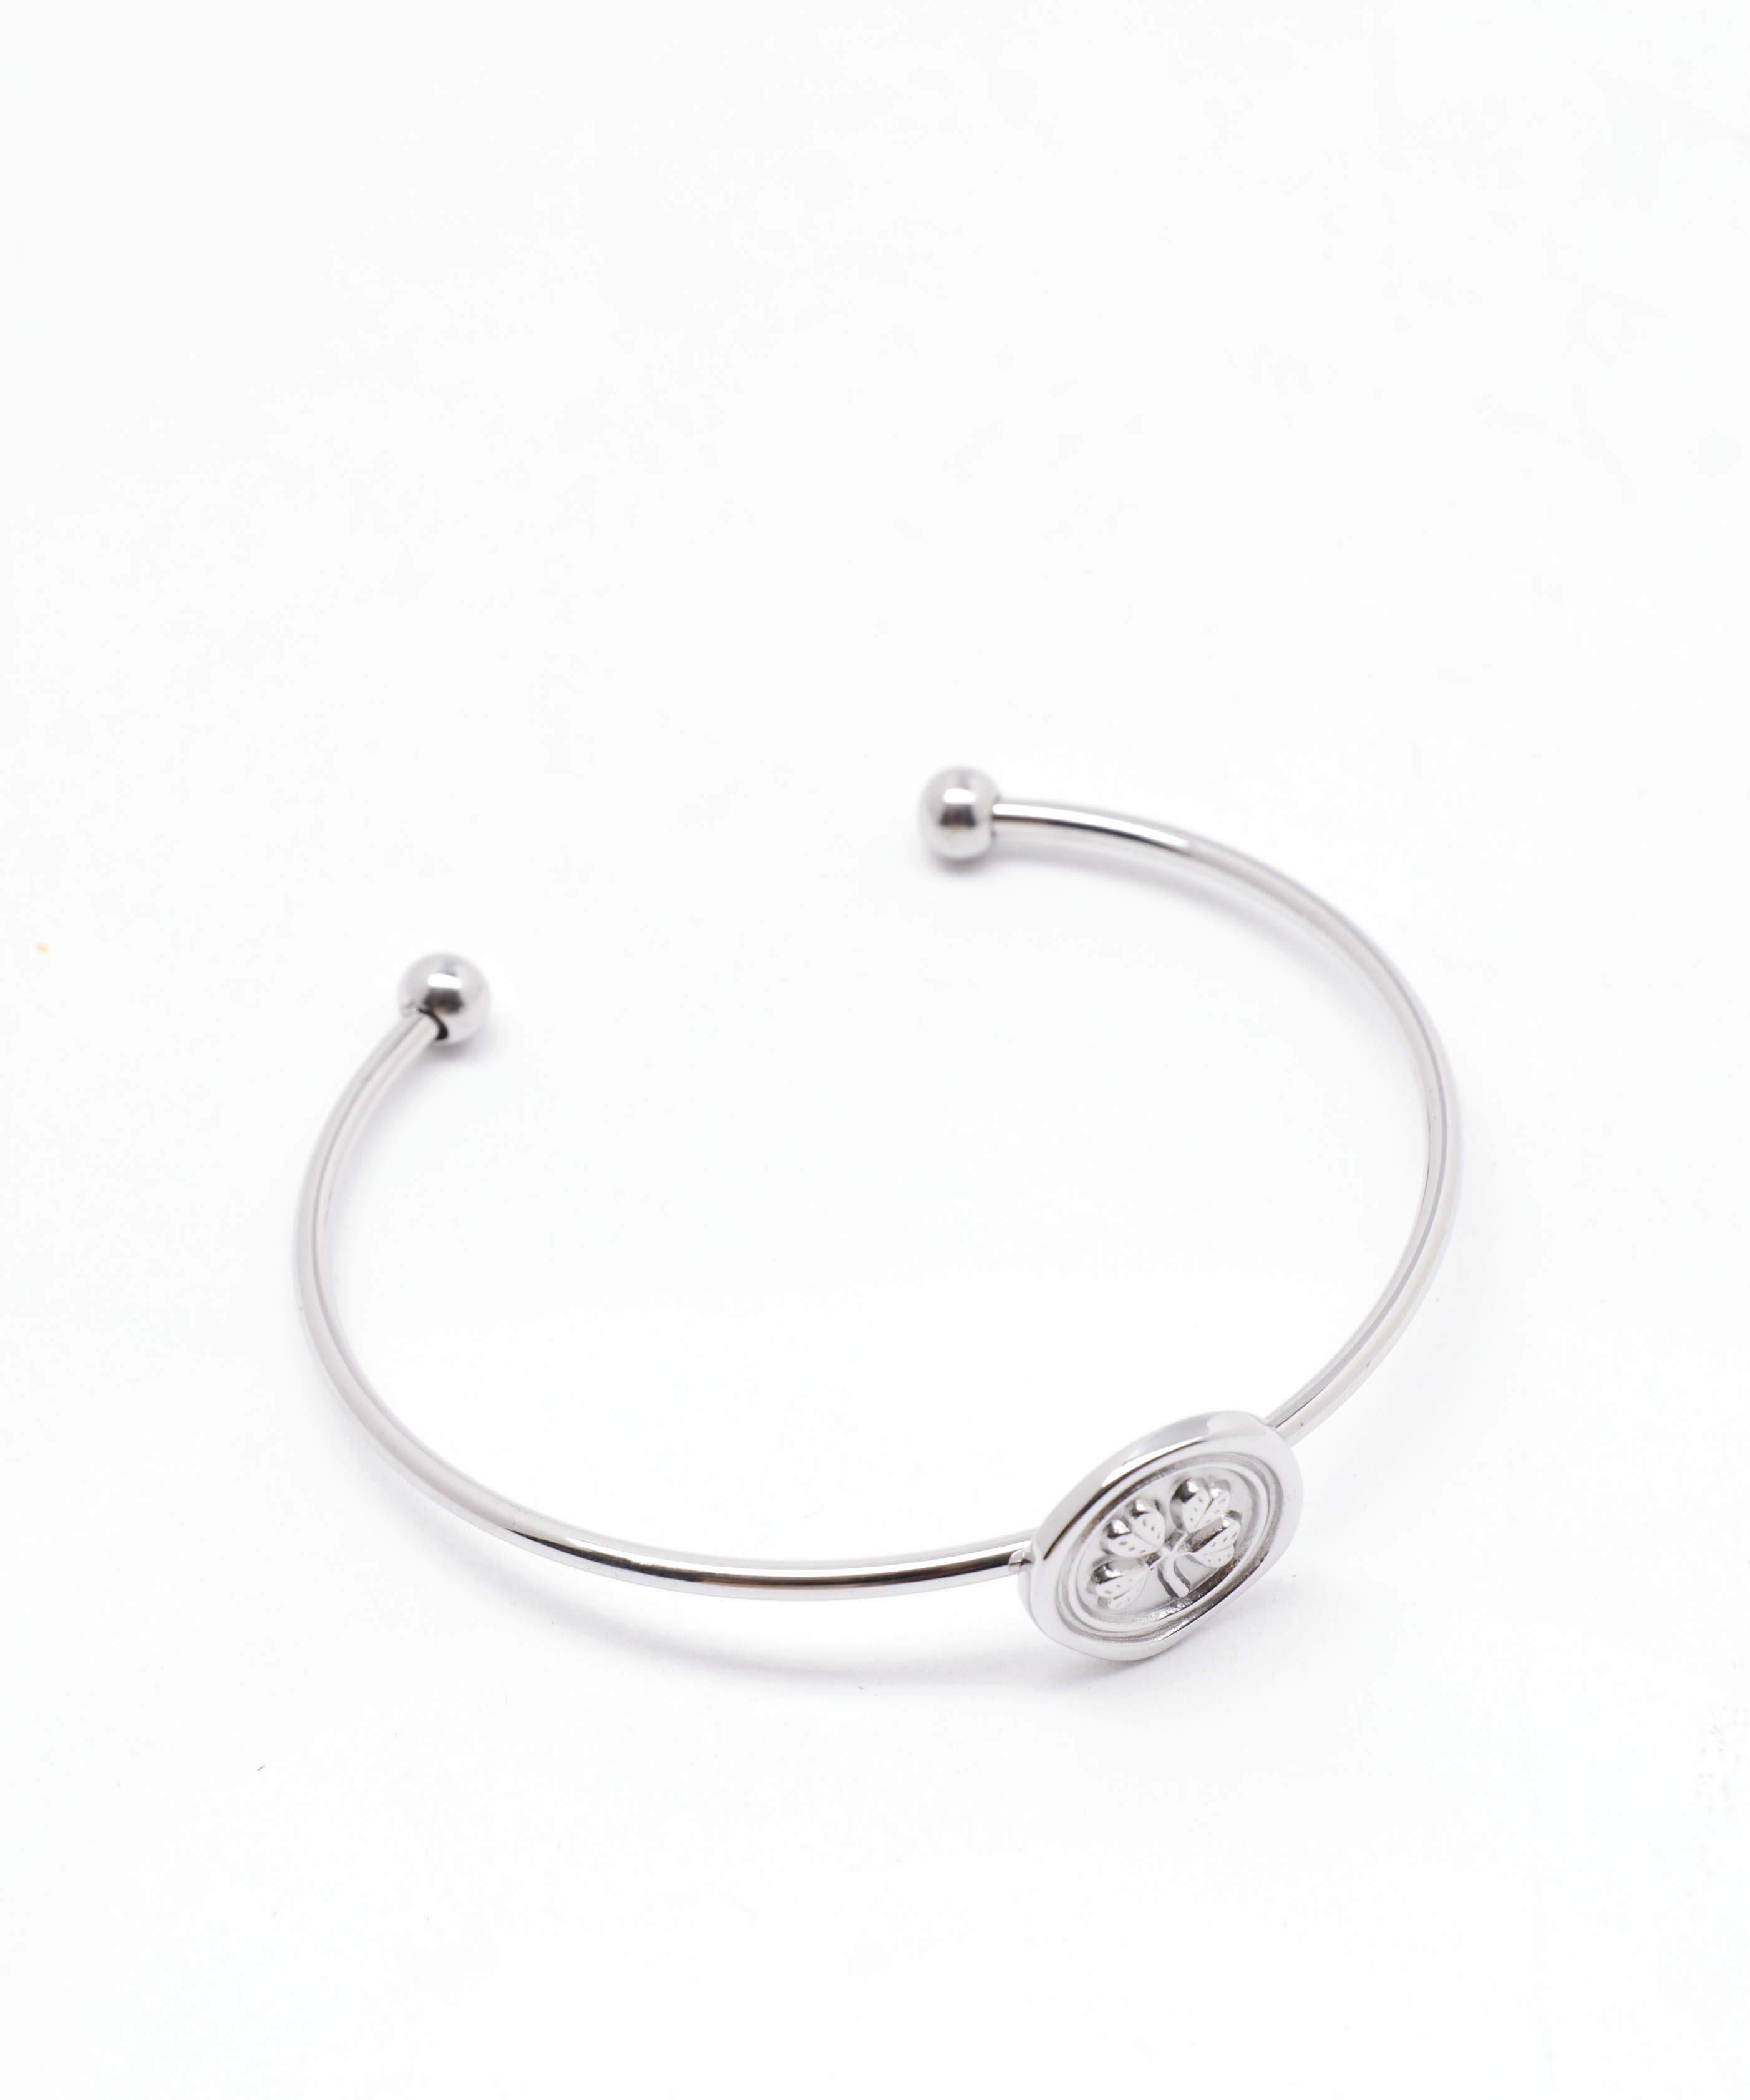 Bijoux Femme - Bracelet Argent Jina - 1004002b